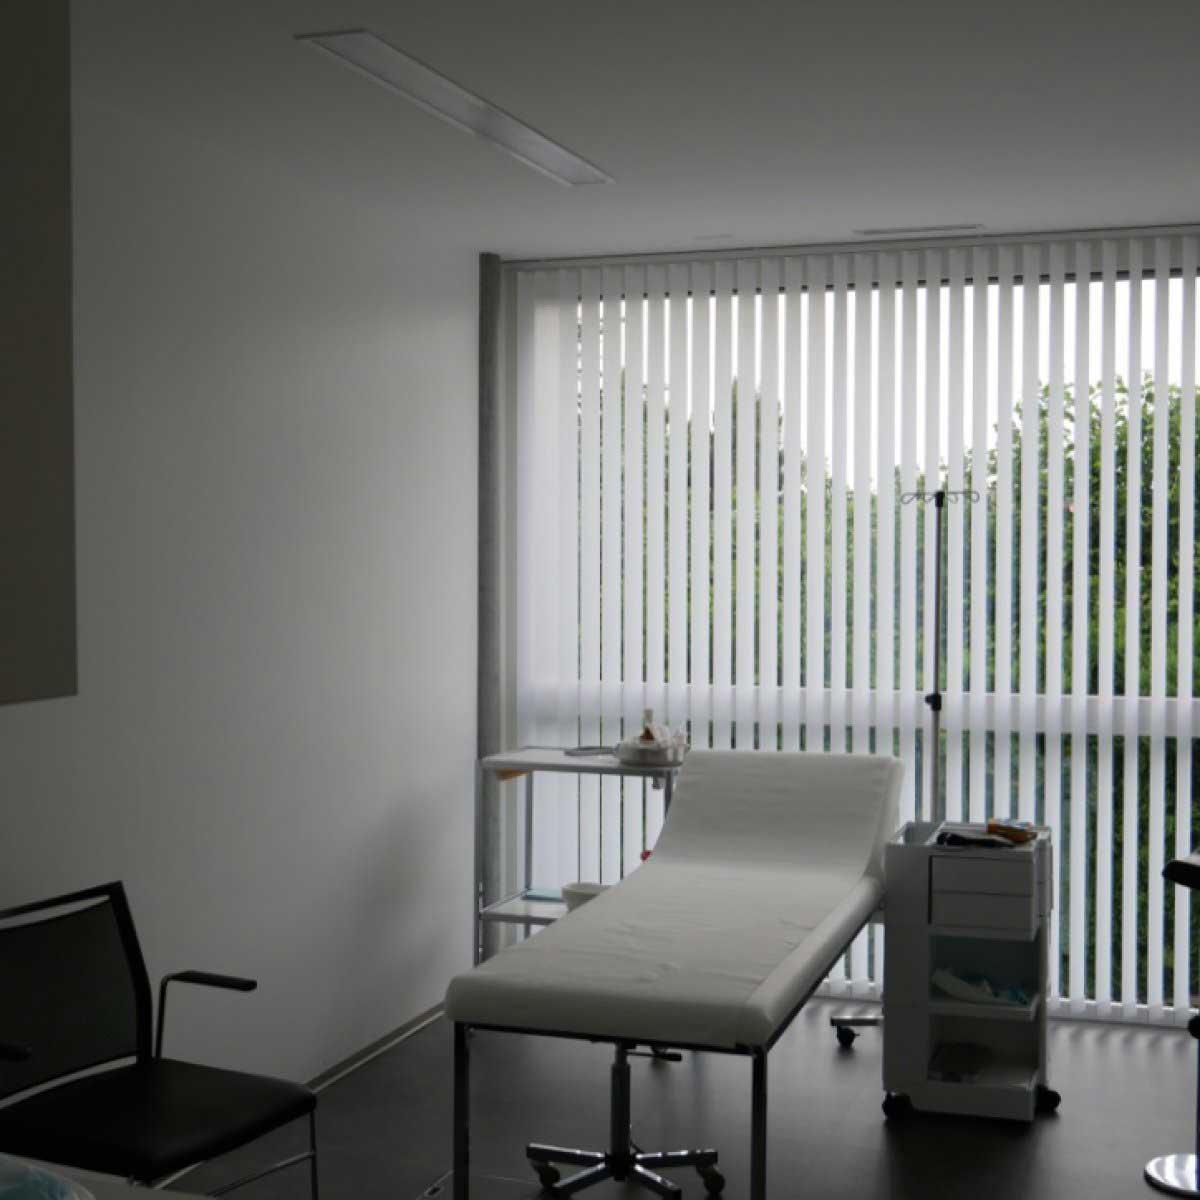 Salle de traitements